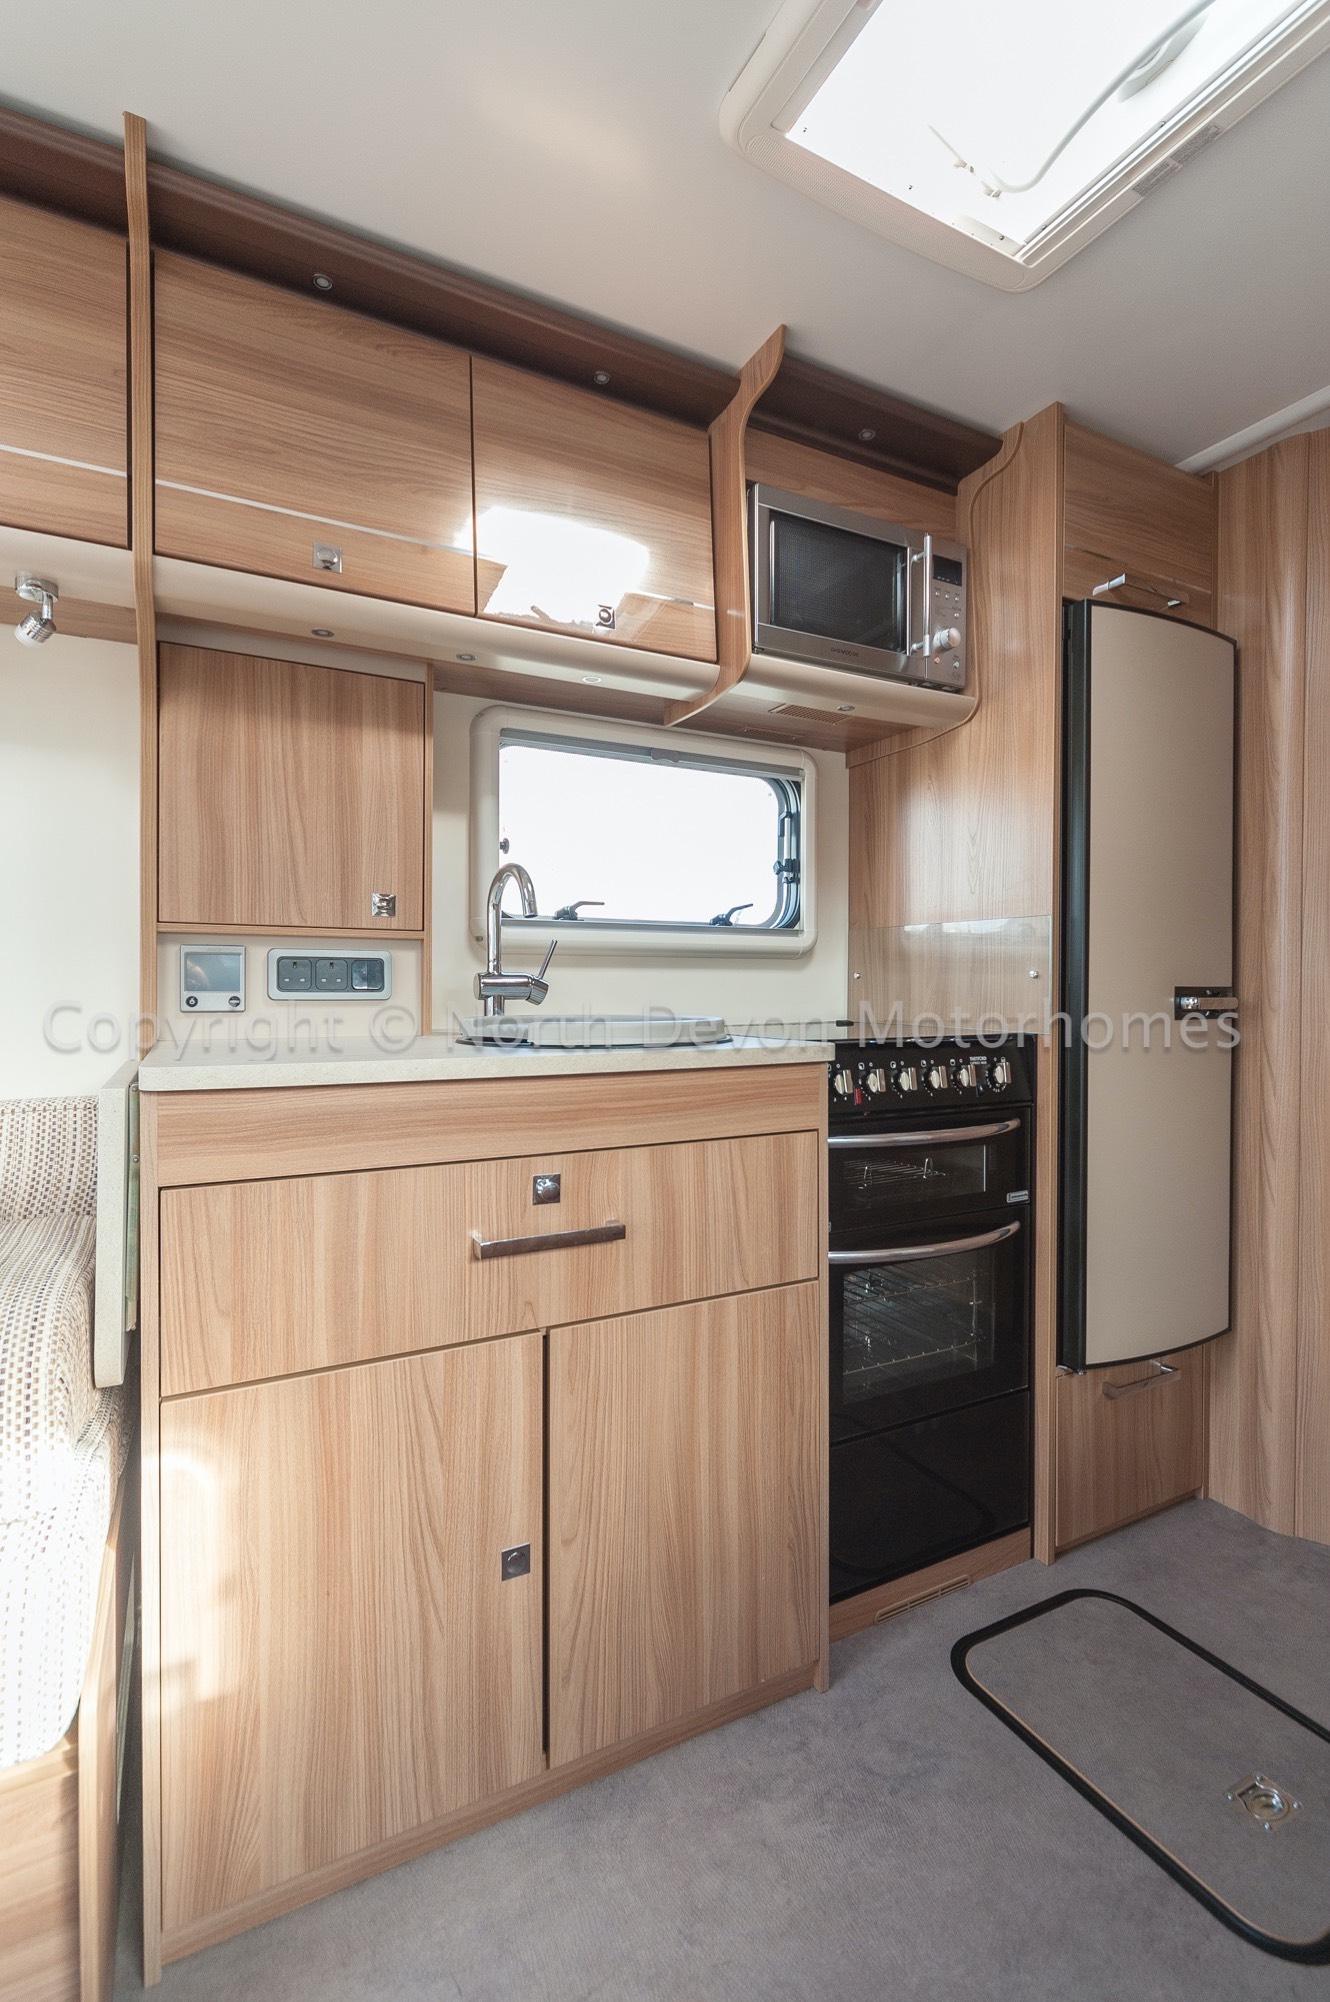 Sold Bailey Unicorn Iii Seville Caravan 2015 2 Berth